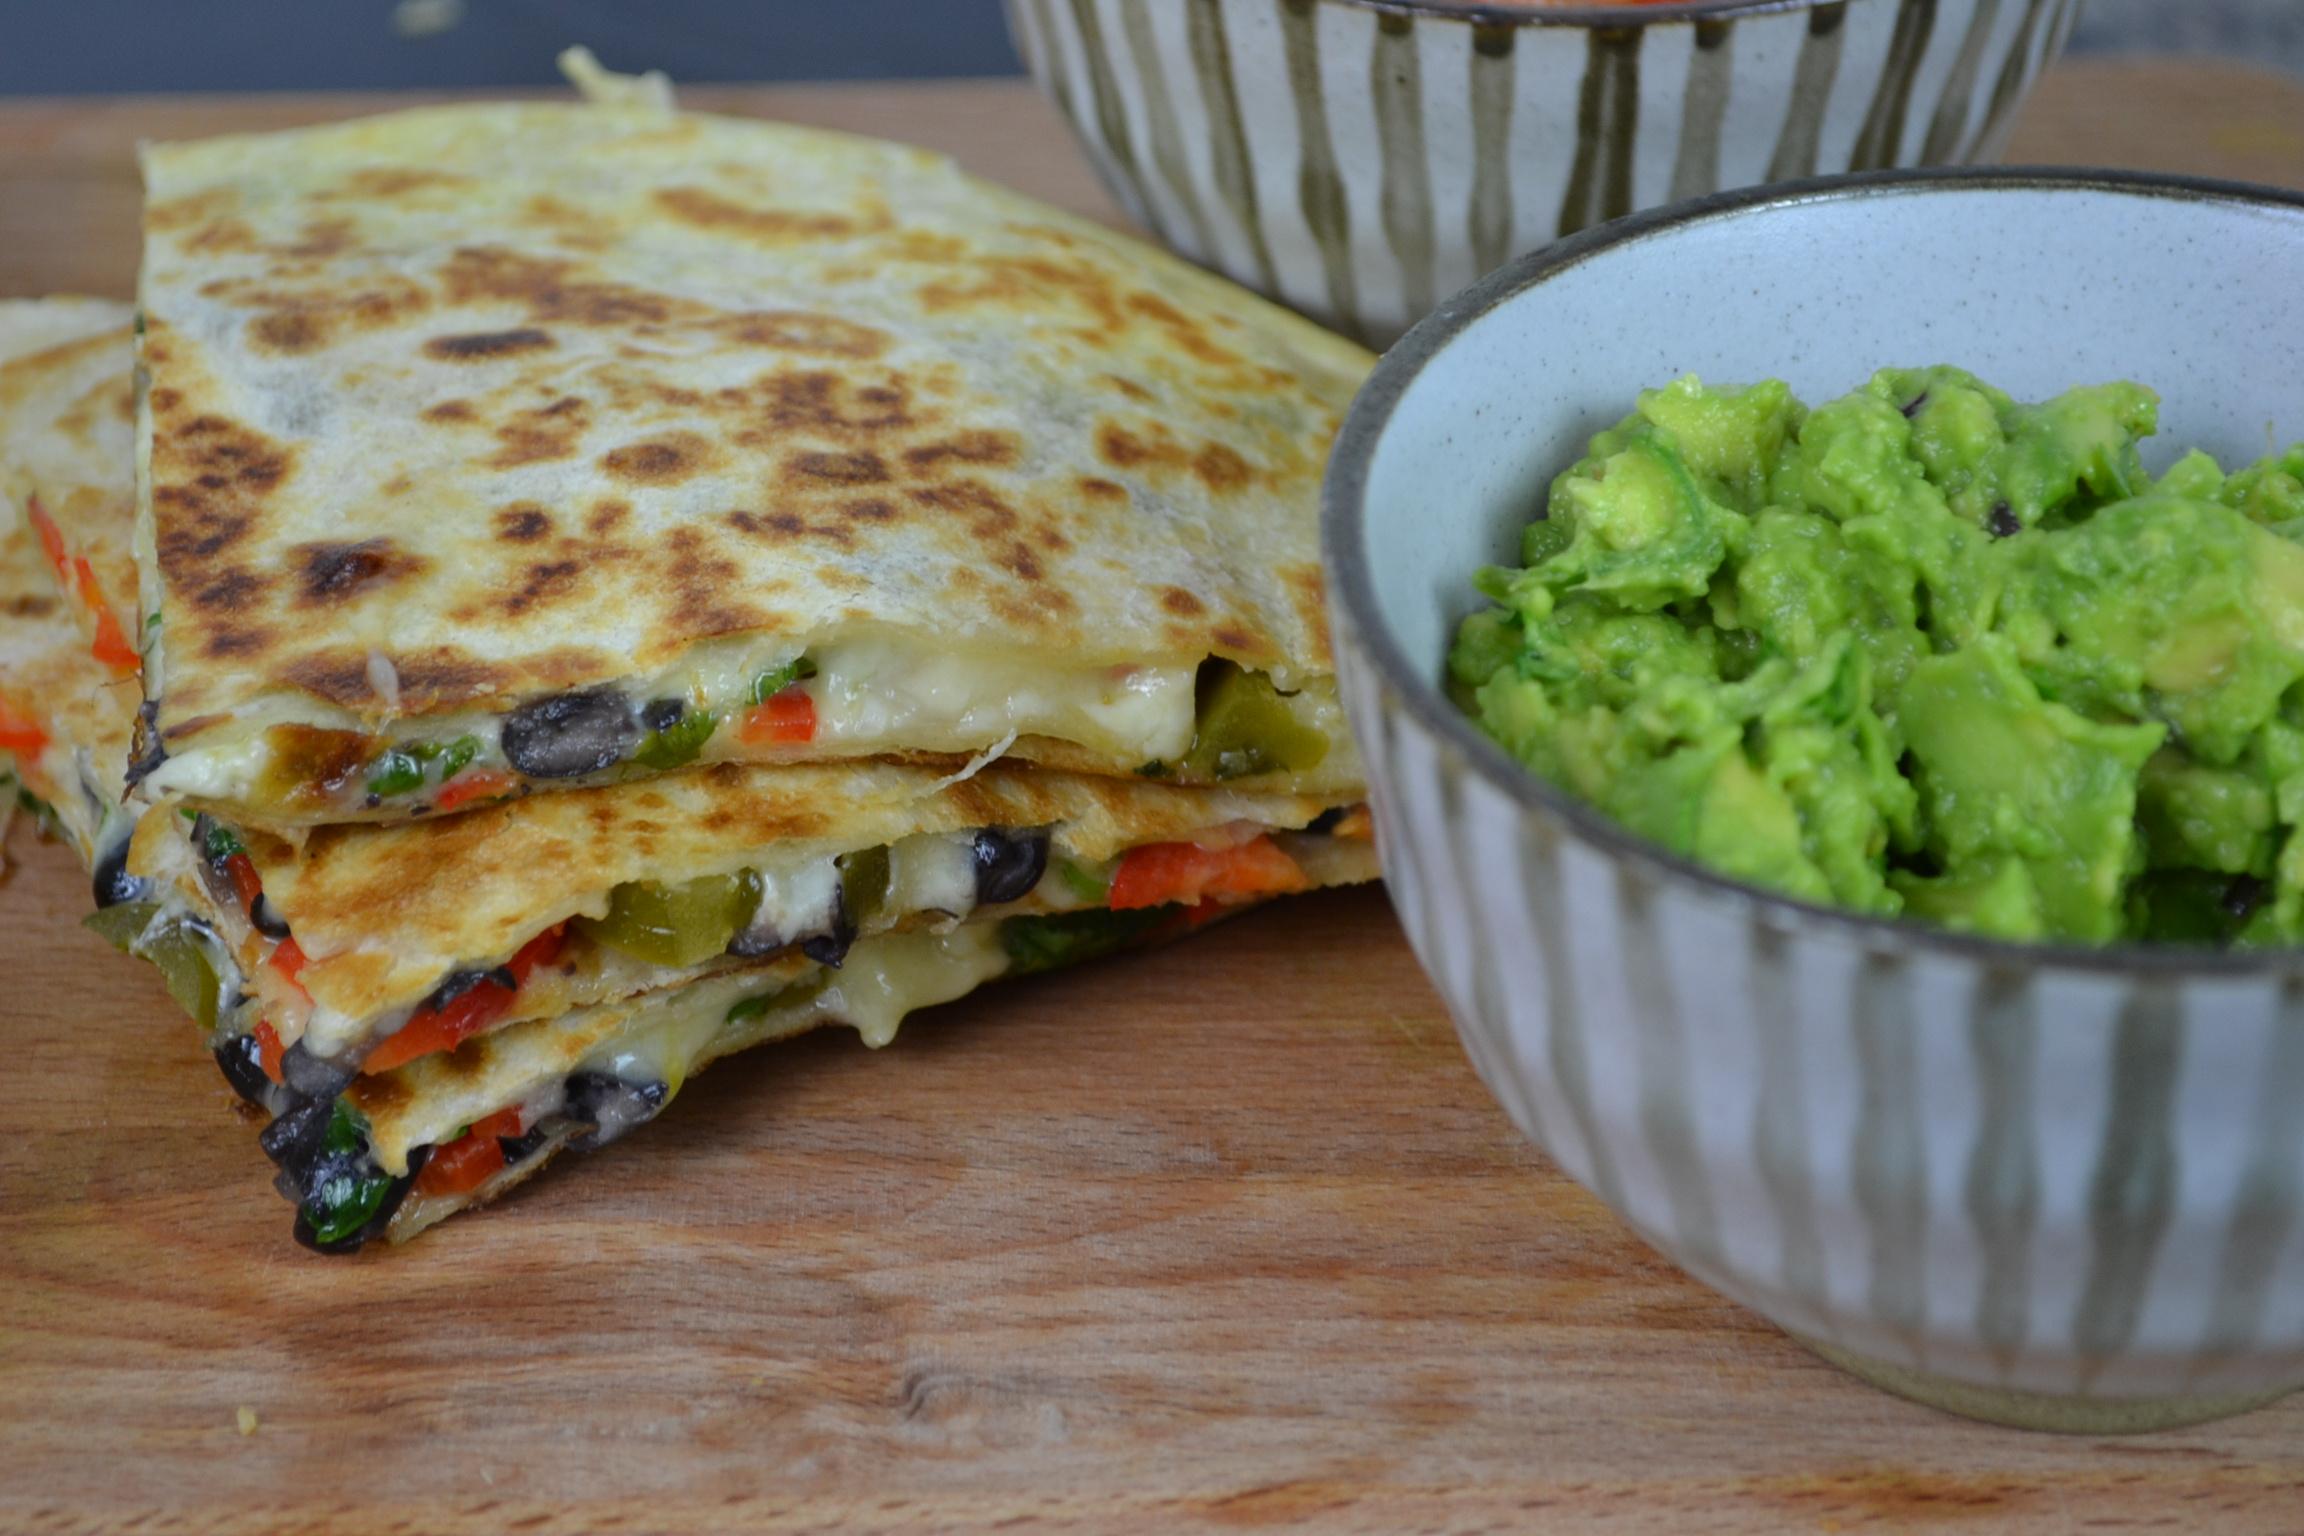 The Best Vegetarian Quesadillas Recipe with Guacamole, Nachos & Tomato Salsa